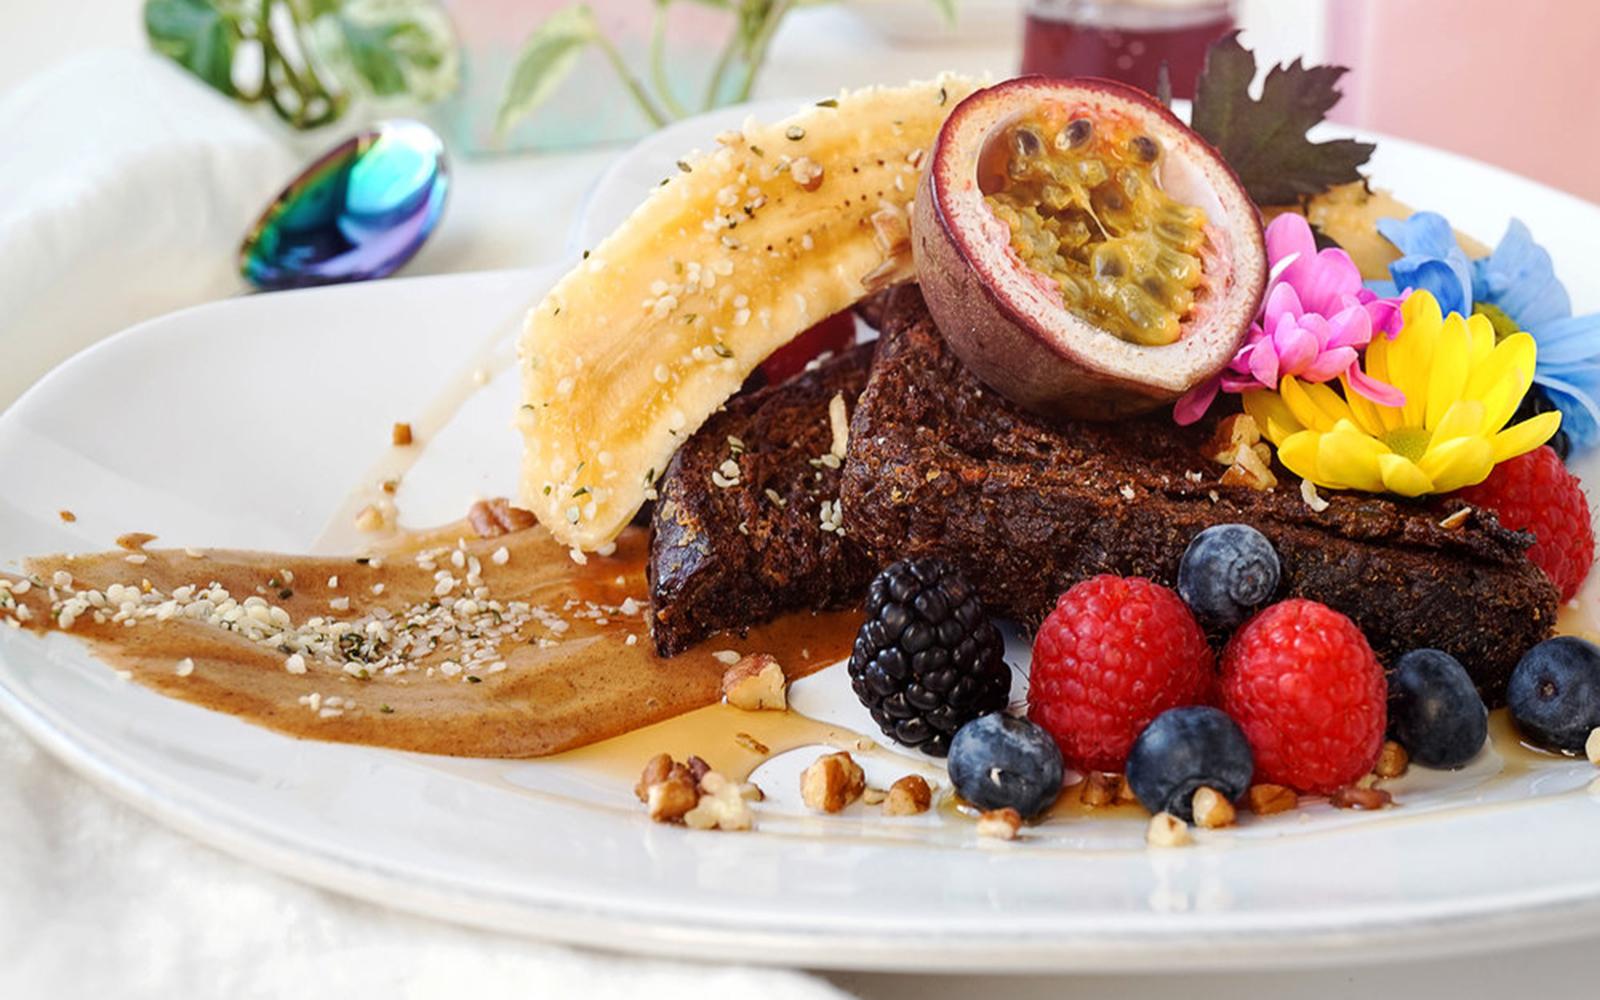 Vegan French Toast healing vegan meals